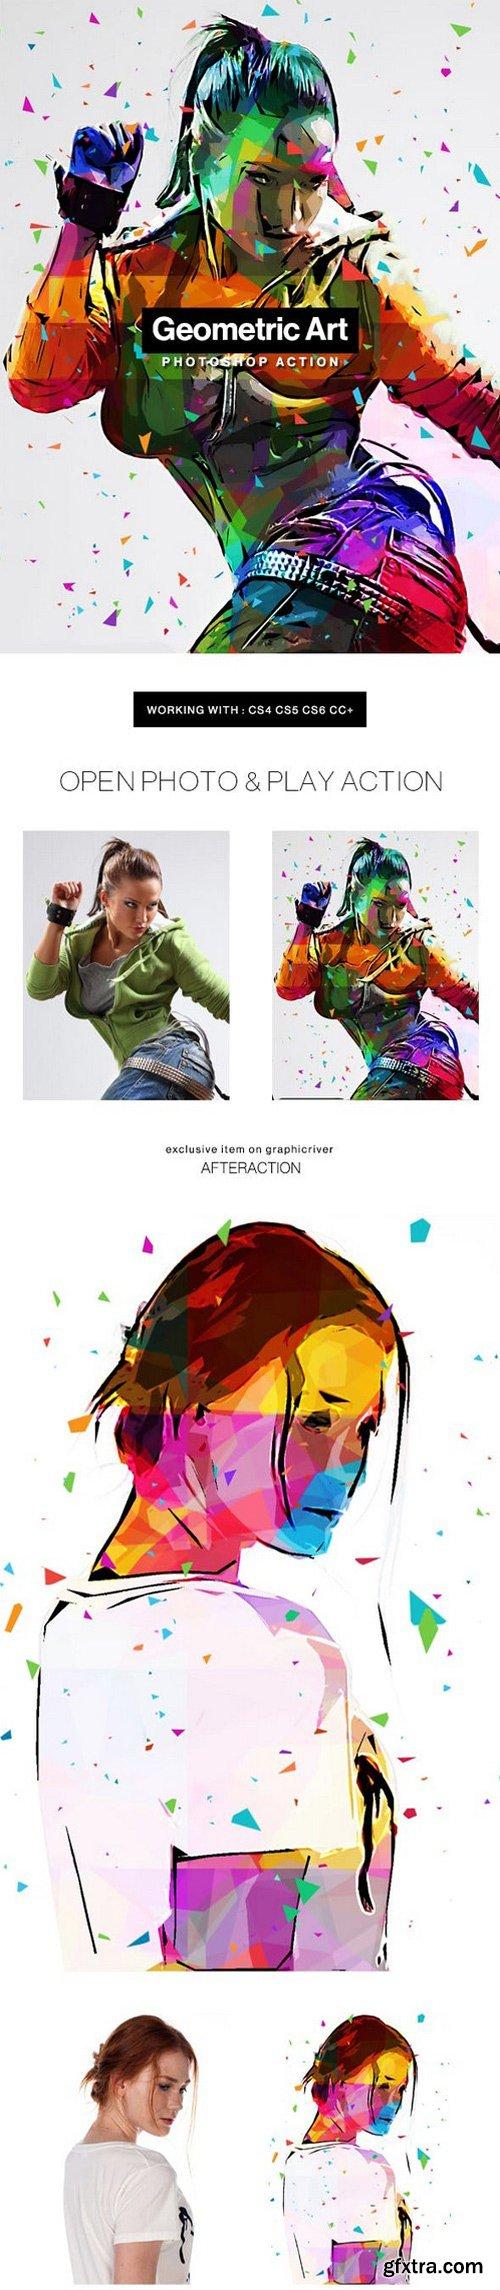 Graphicriver - Geometric Art Photoshop Action 20543613